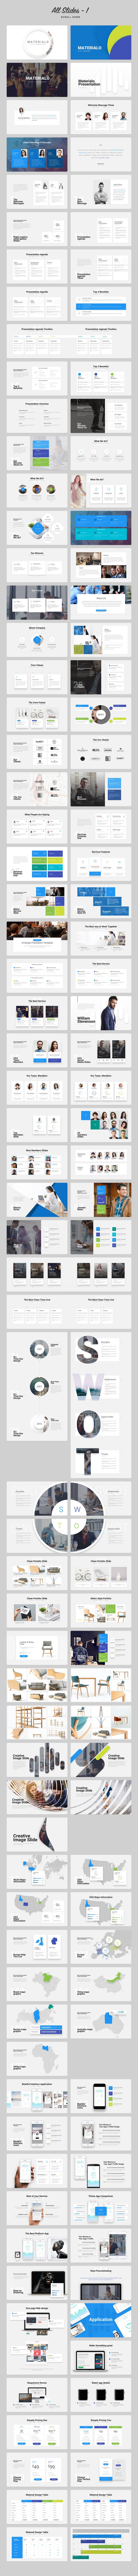 Materialo-Powerpoint UI KIT by dublin_design on @creativemarket